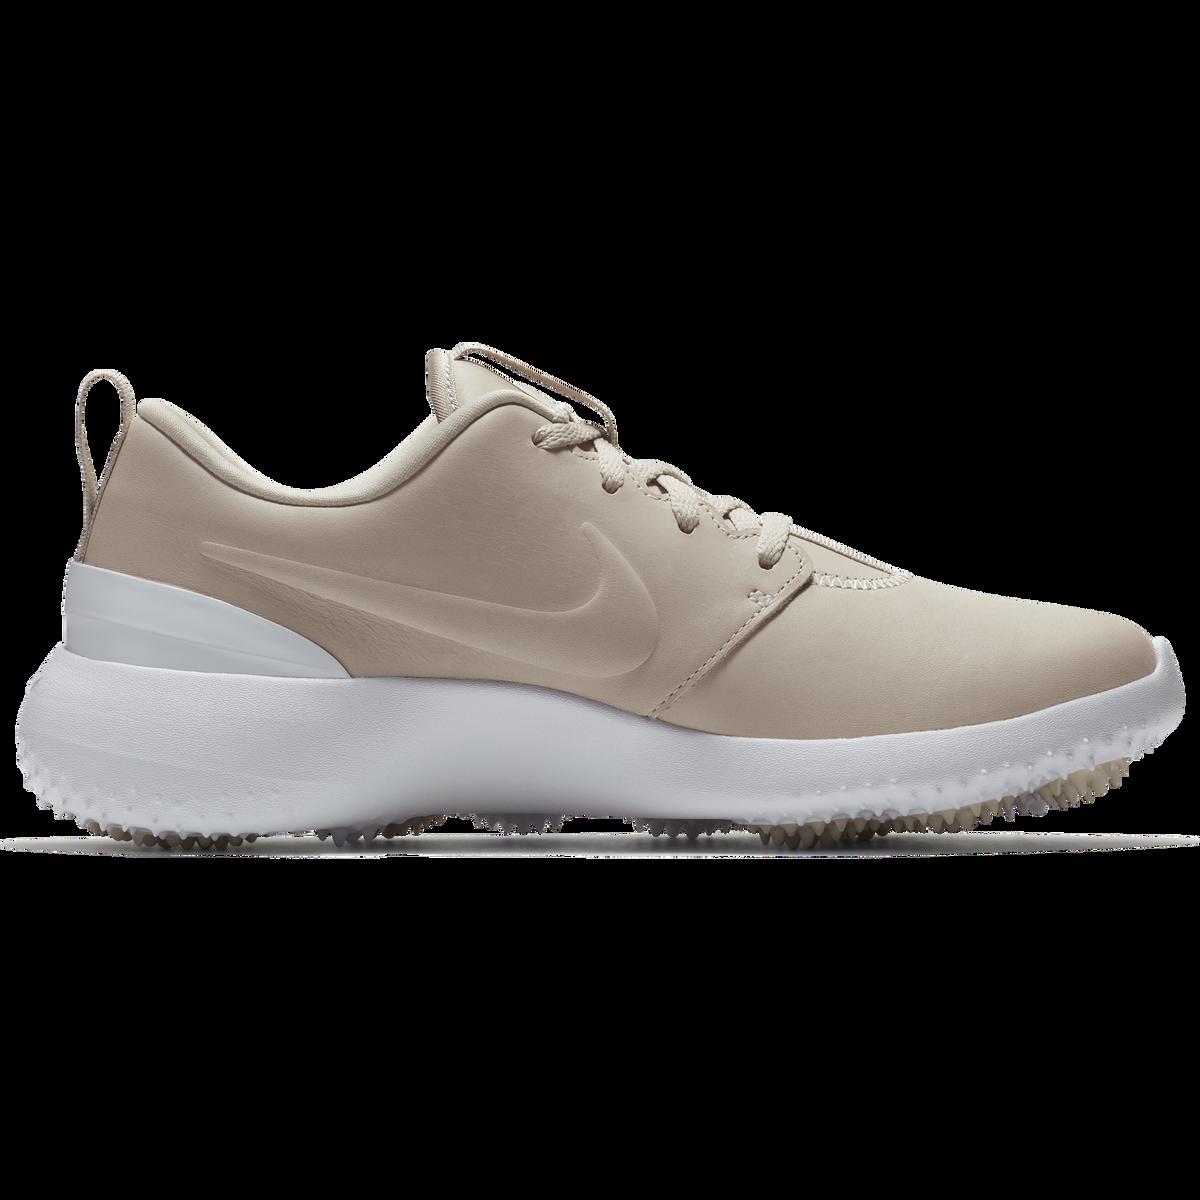 05ac9ab8a7b5 Nike Roshe G Premium Women s Golf Shoe - Tan